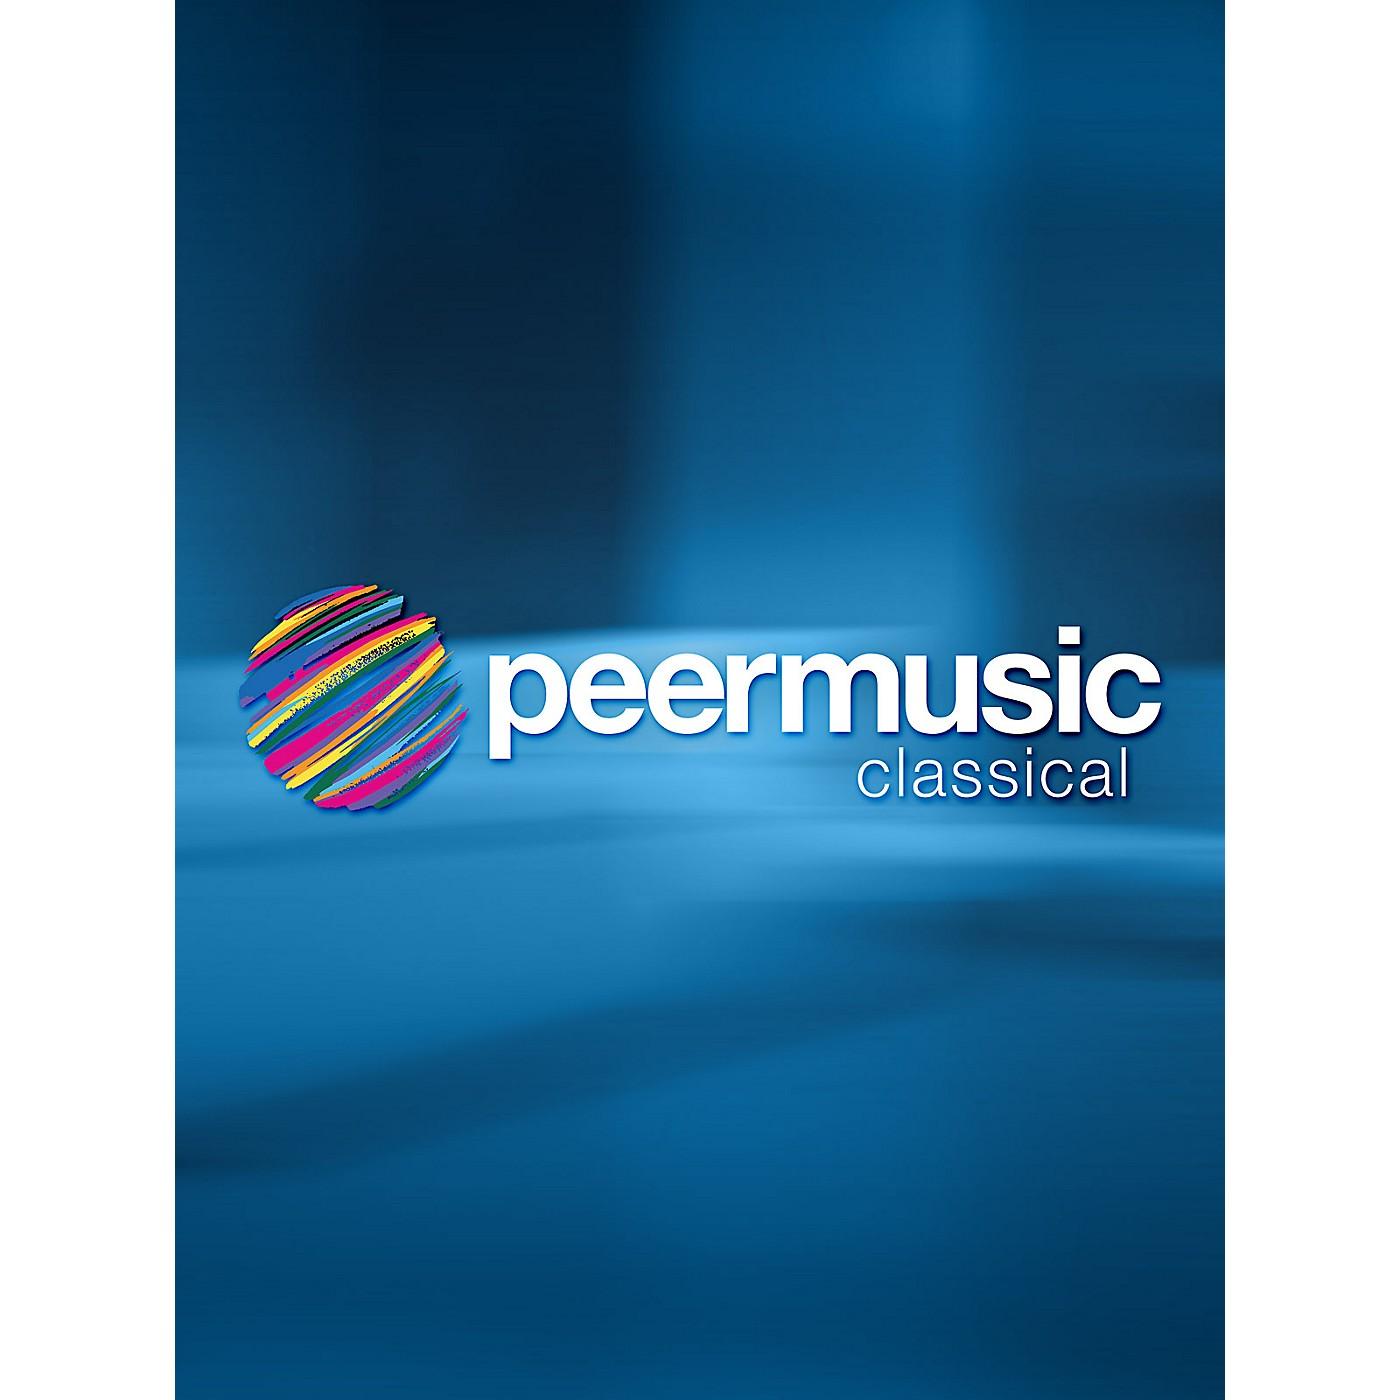 Peer Music Pastorale (Organ Solo) Peermusic Classical Series Softcover thumbnail